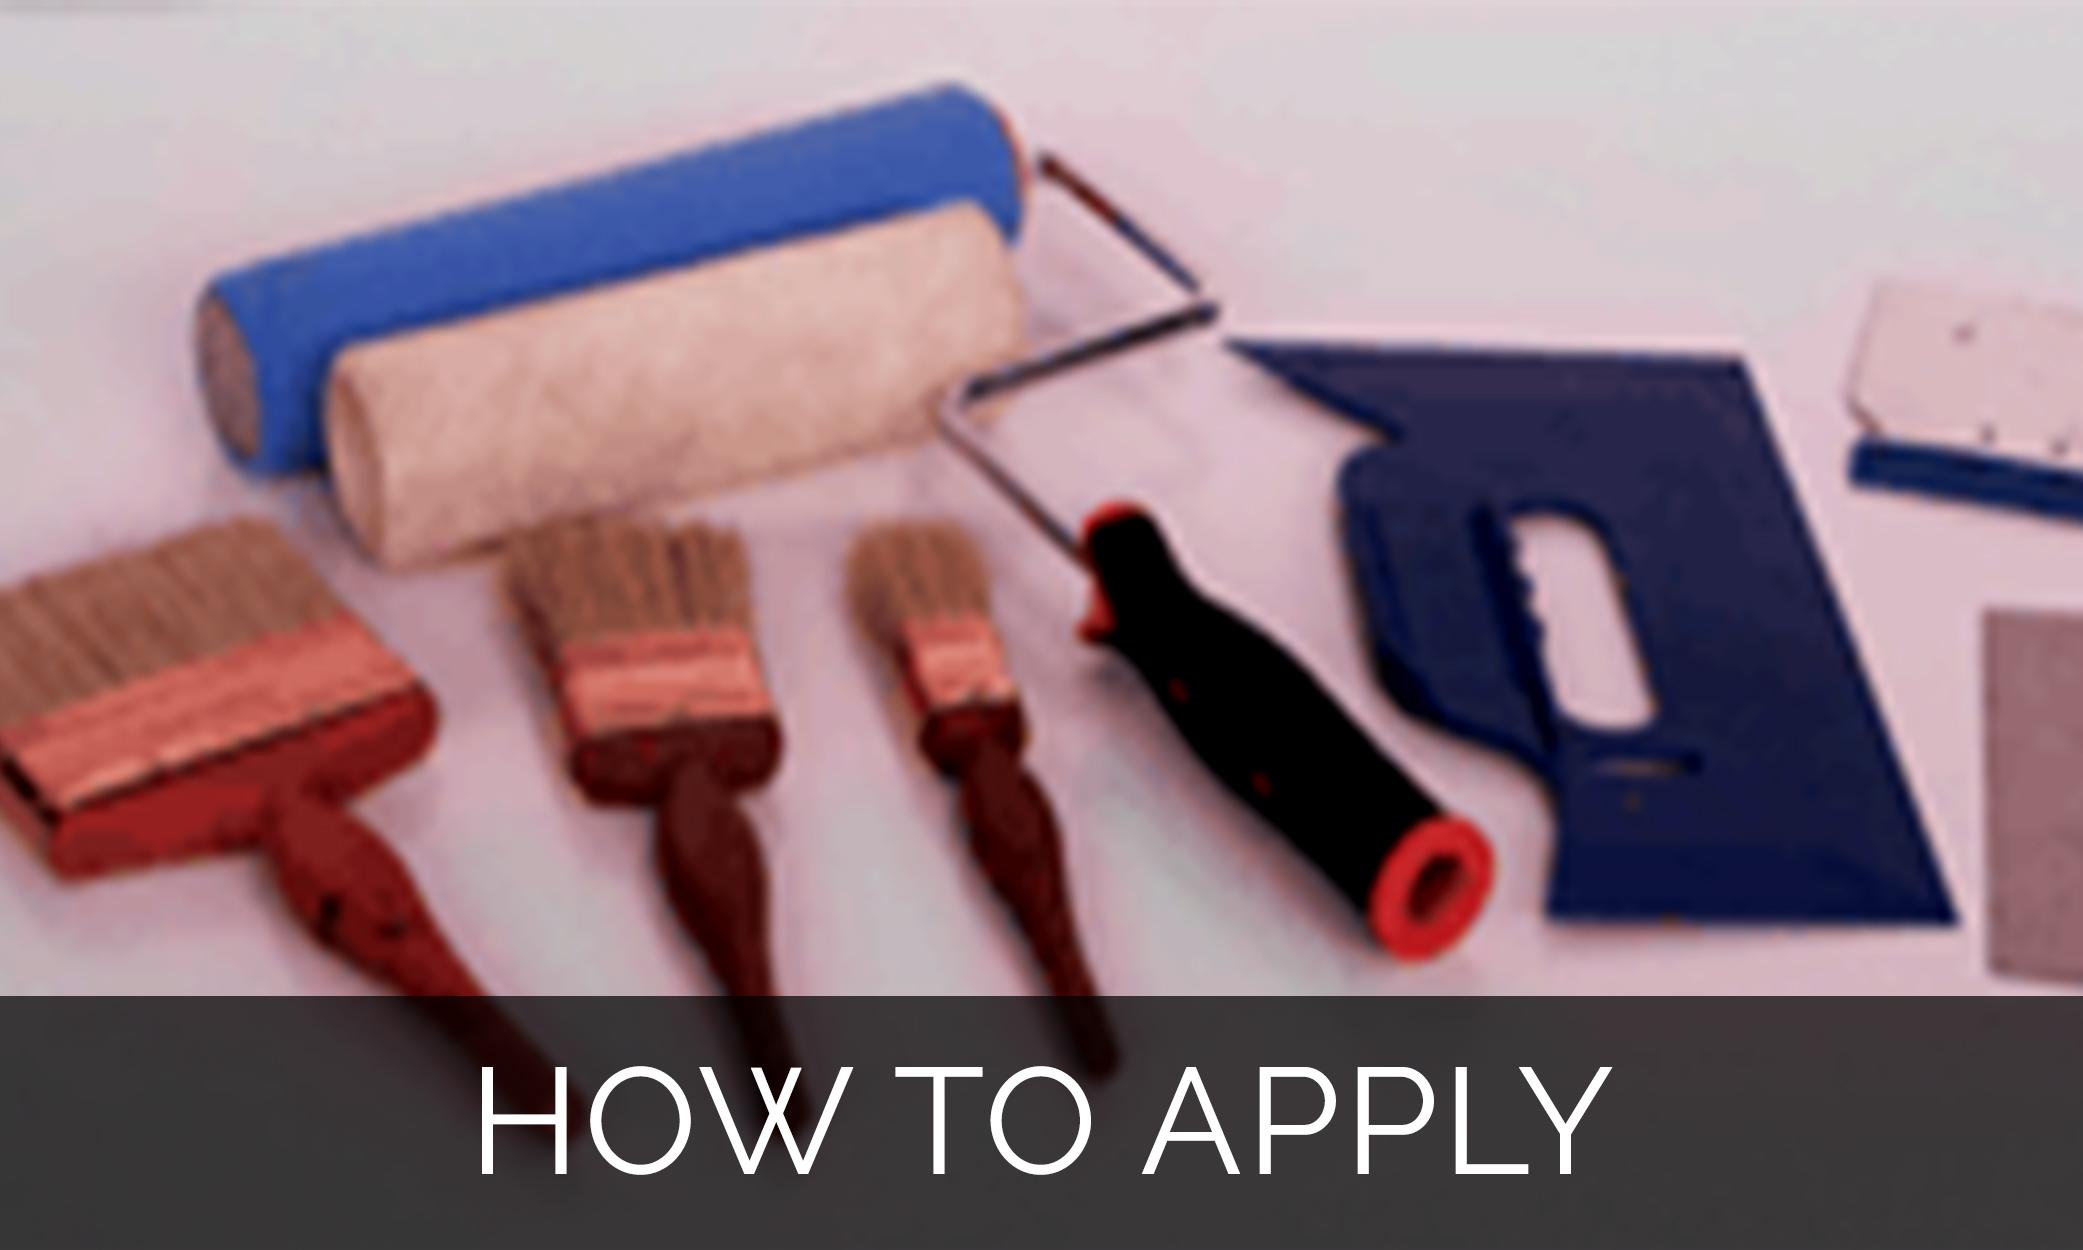 how-to-apply-liqmet.jpg